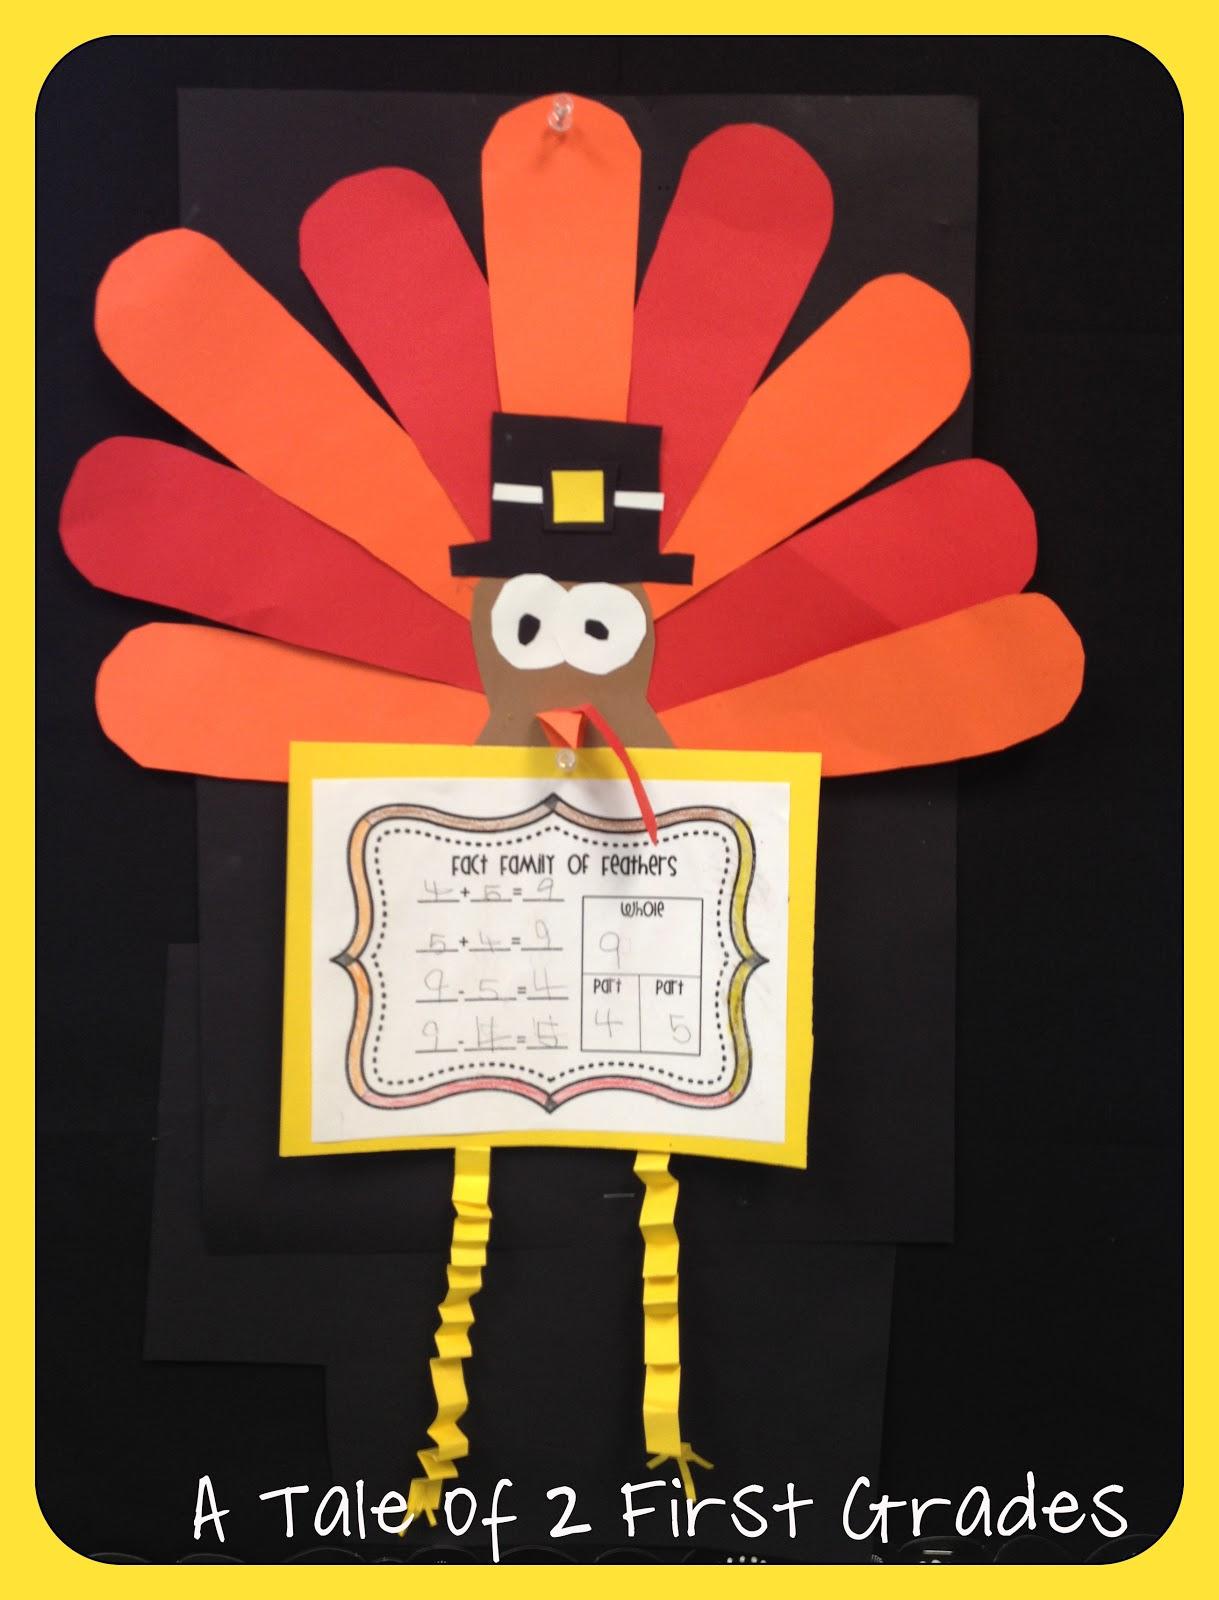 Family turkey project template 3108881 hitori49fo turkey project template disney family recipes crafts and activities maxwellsz